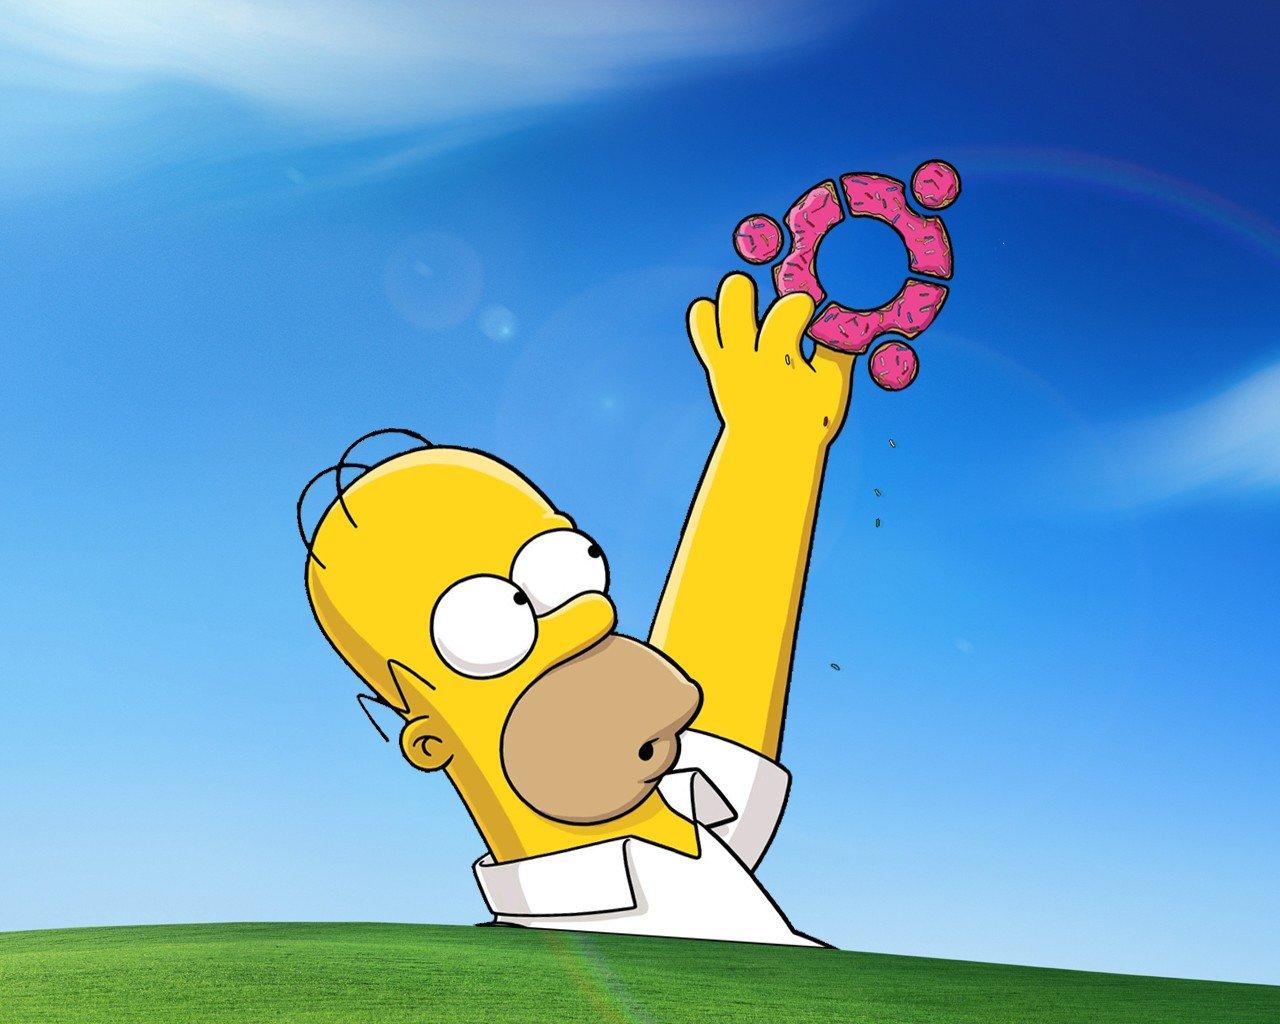 Fondos de pantalla 1280x1024 px u homero simpson - Bart simpson nu ...